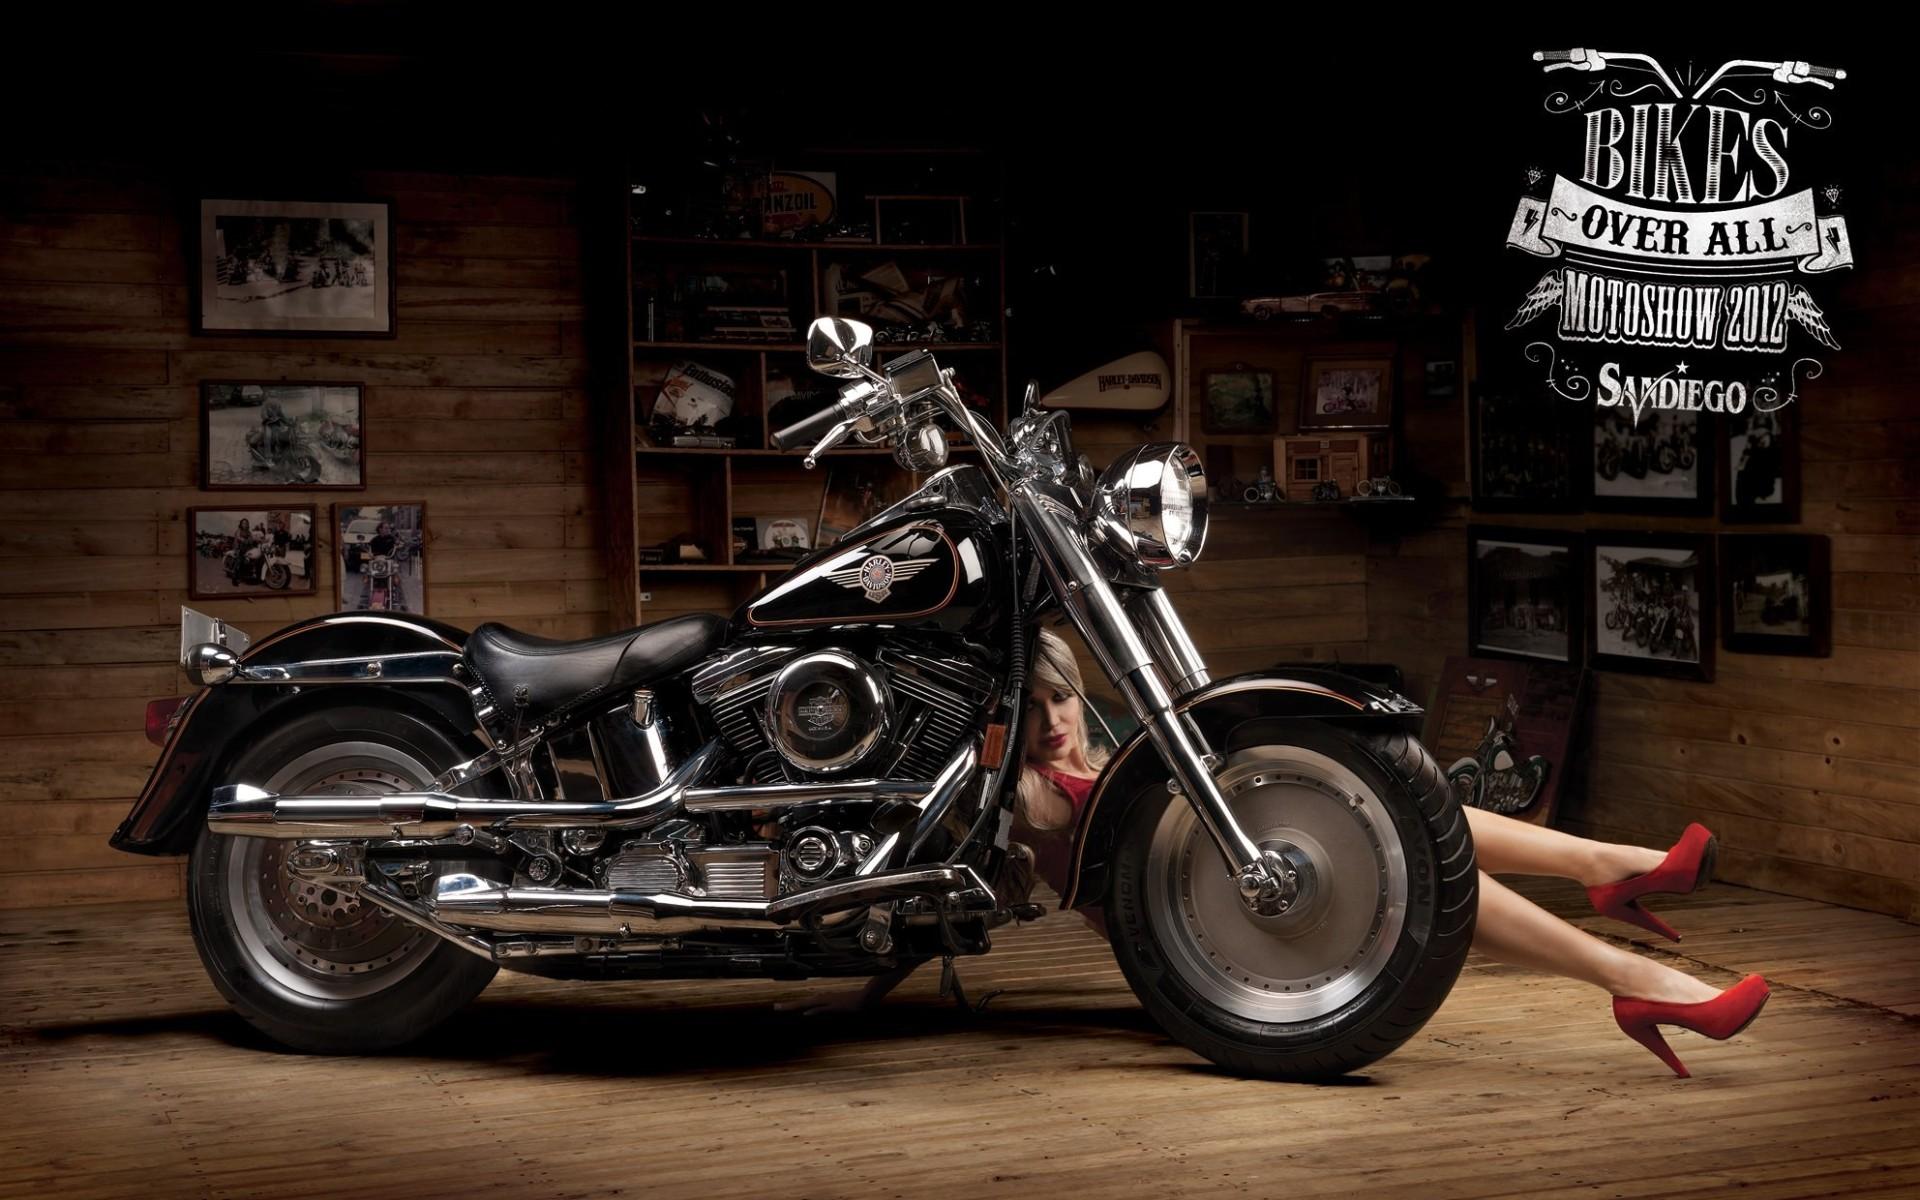 Harley Davidson Wallpaper HD Widescreen 1920x1200